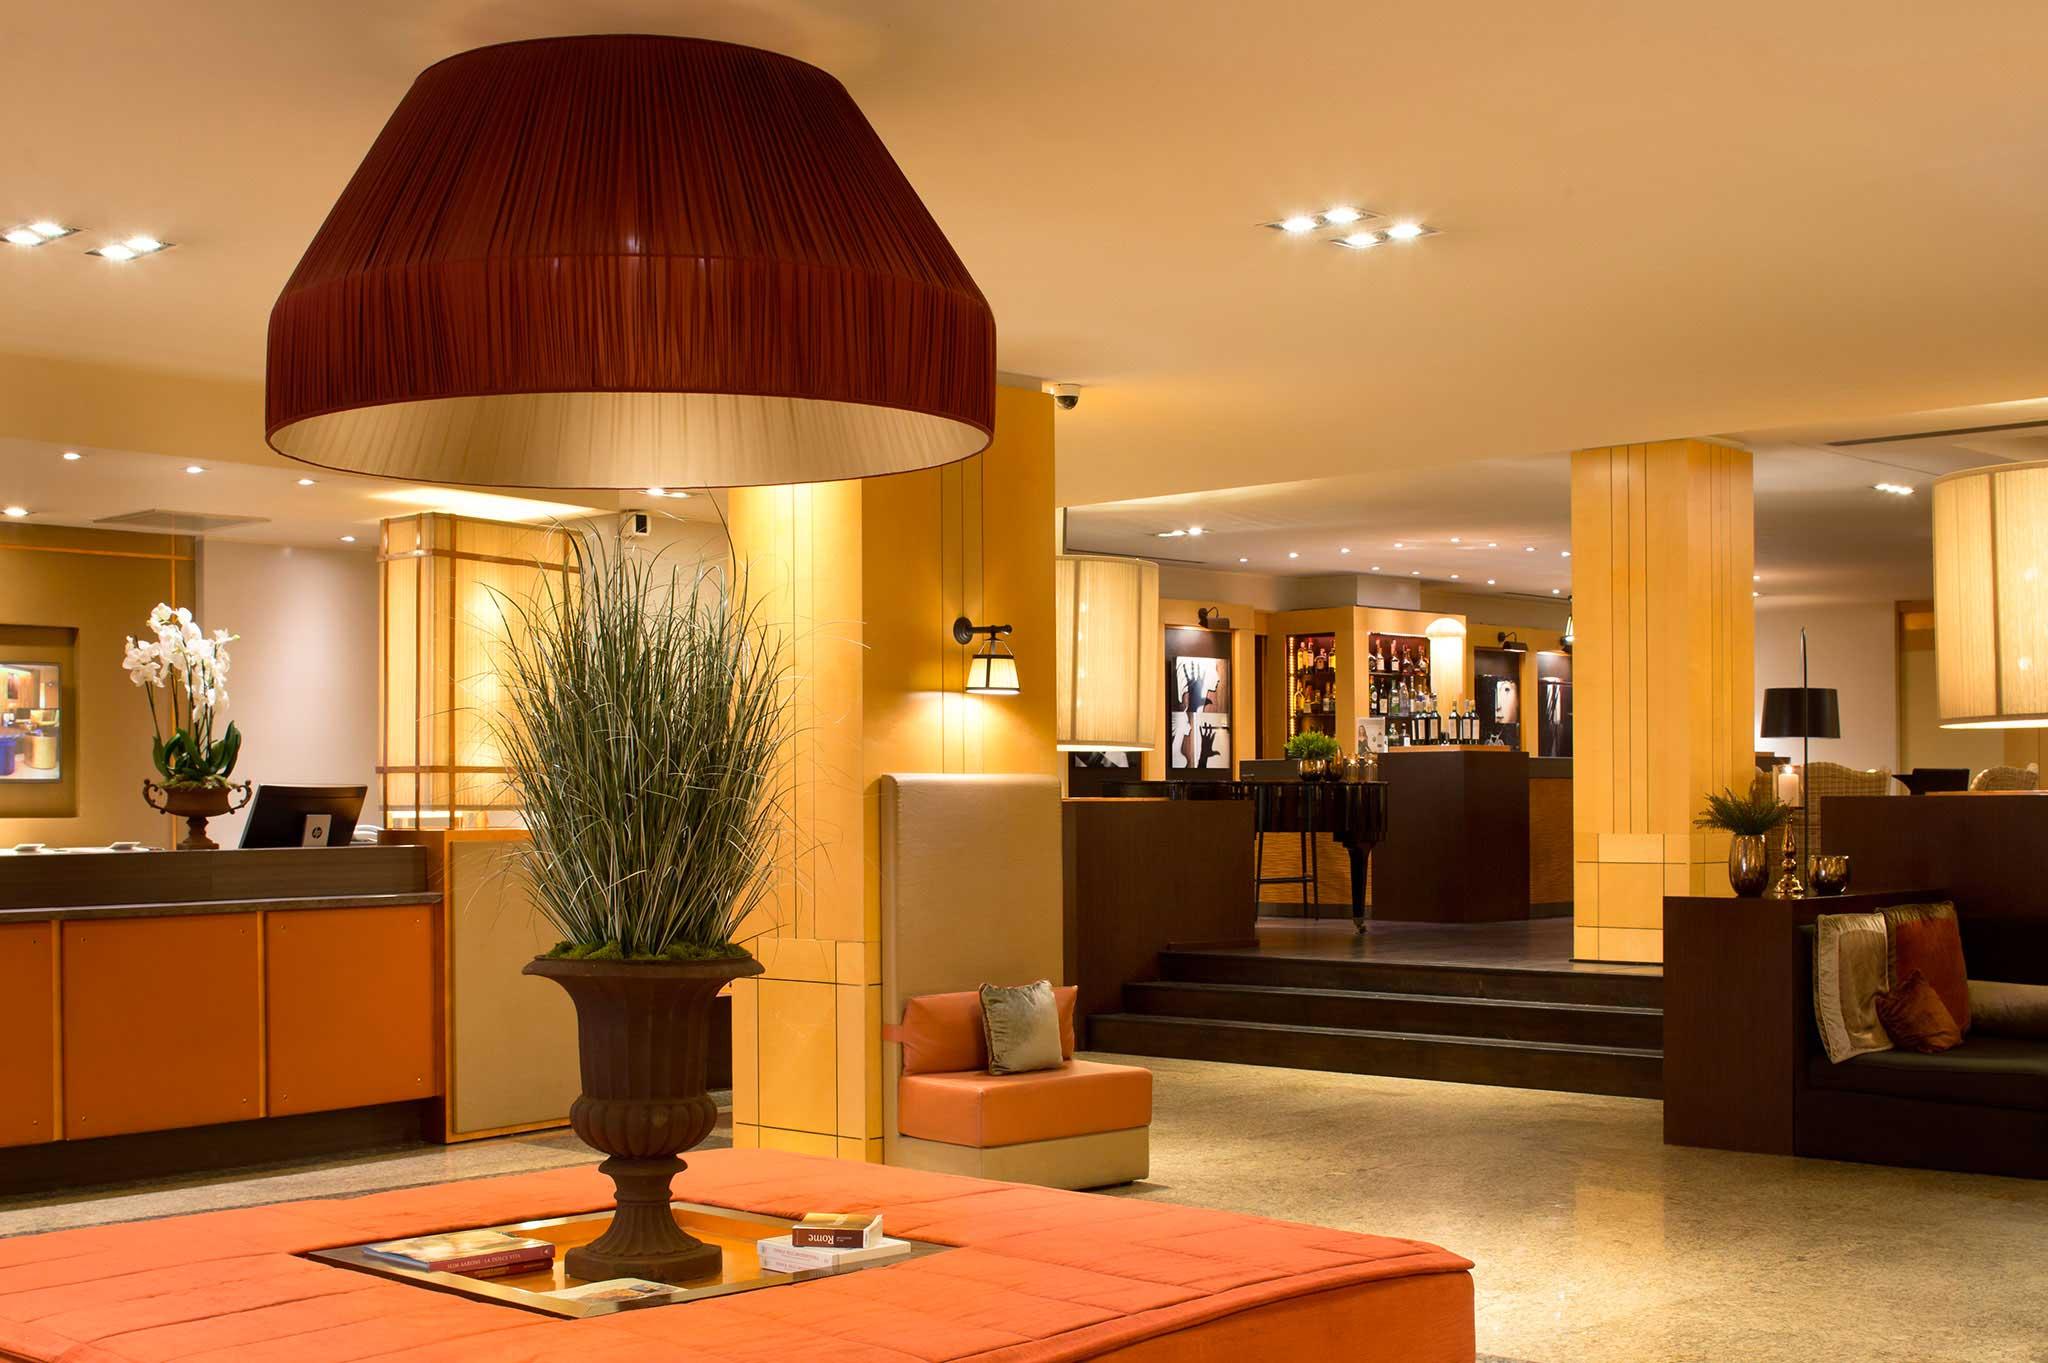 Sale Riunioni Roma Termini : Starhotels metropole 4 star hotel near rome train station of termini